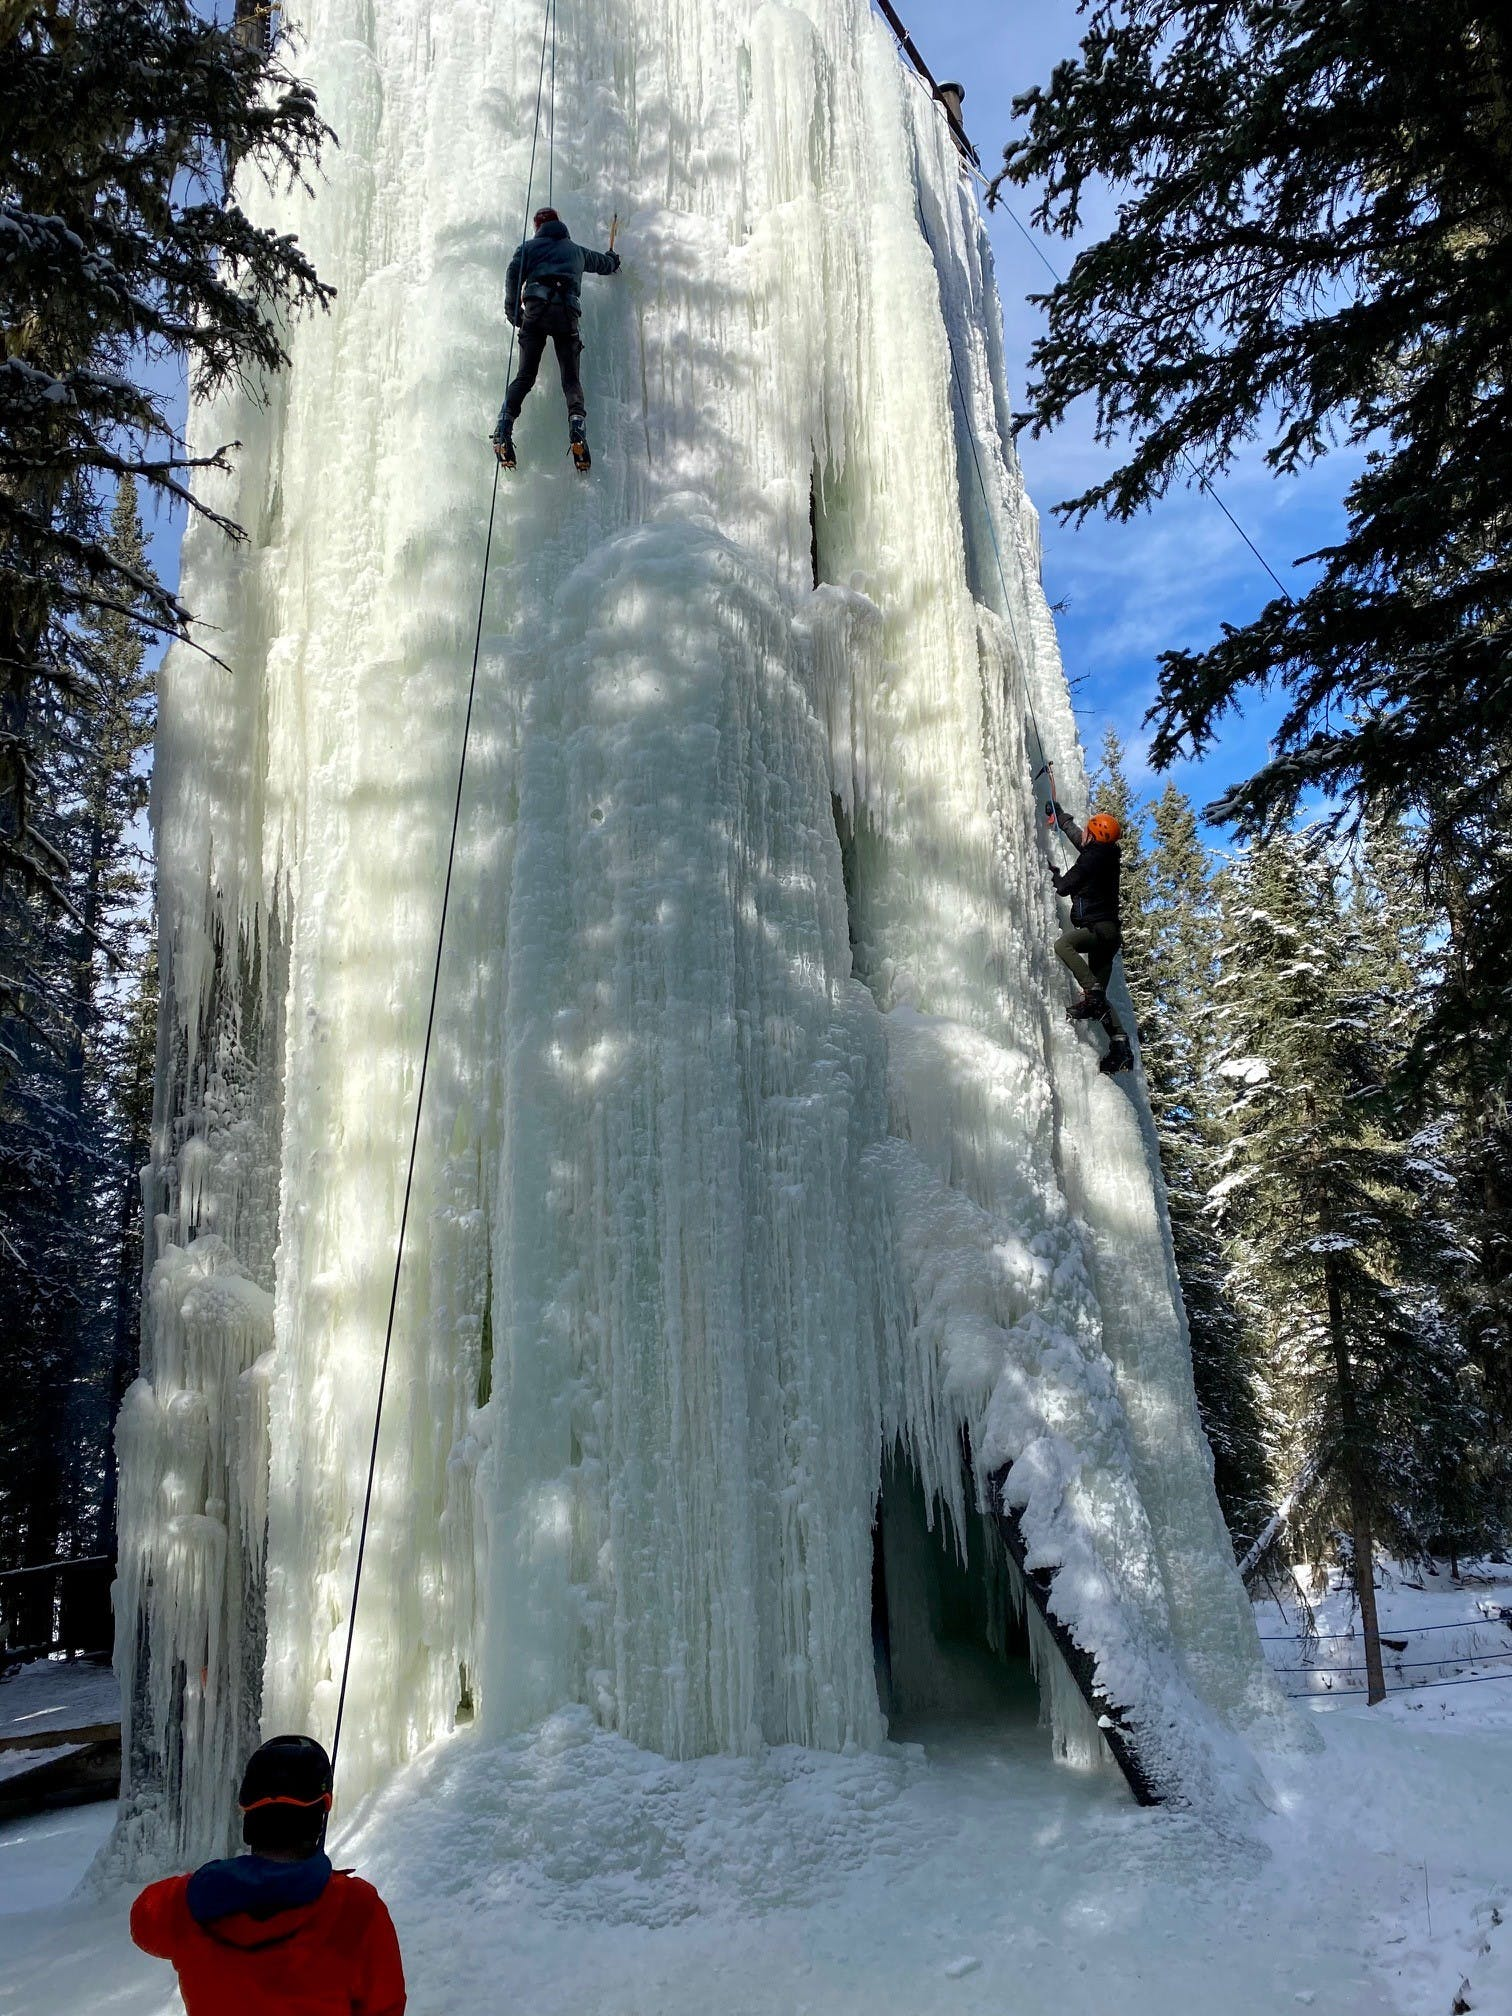 Ice climbing at Frontier Lodge, Nordegg, AB